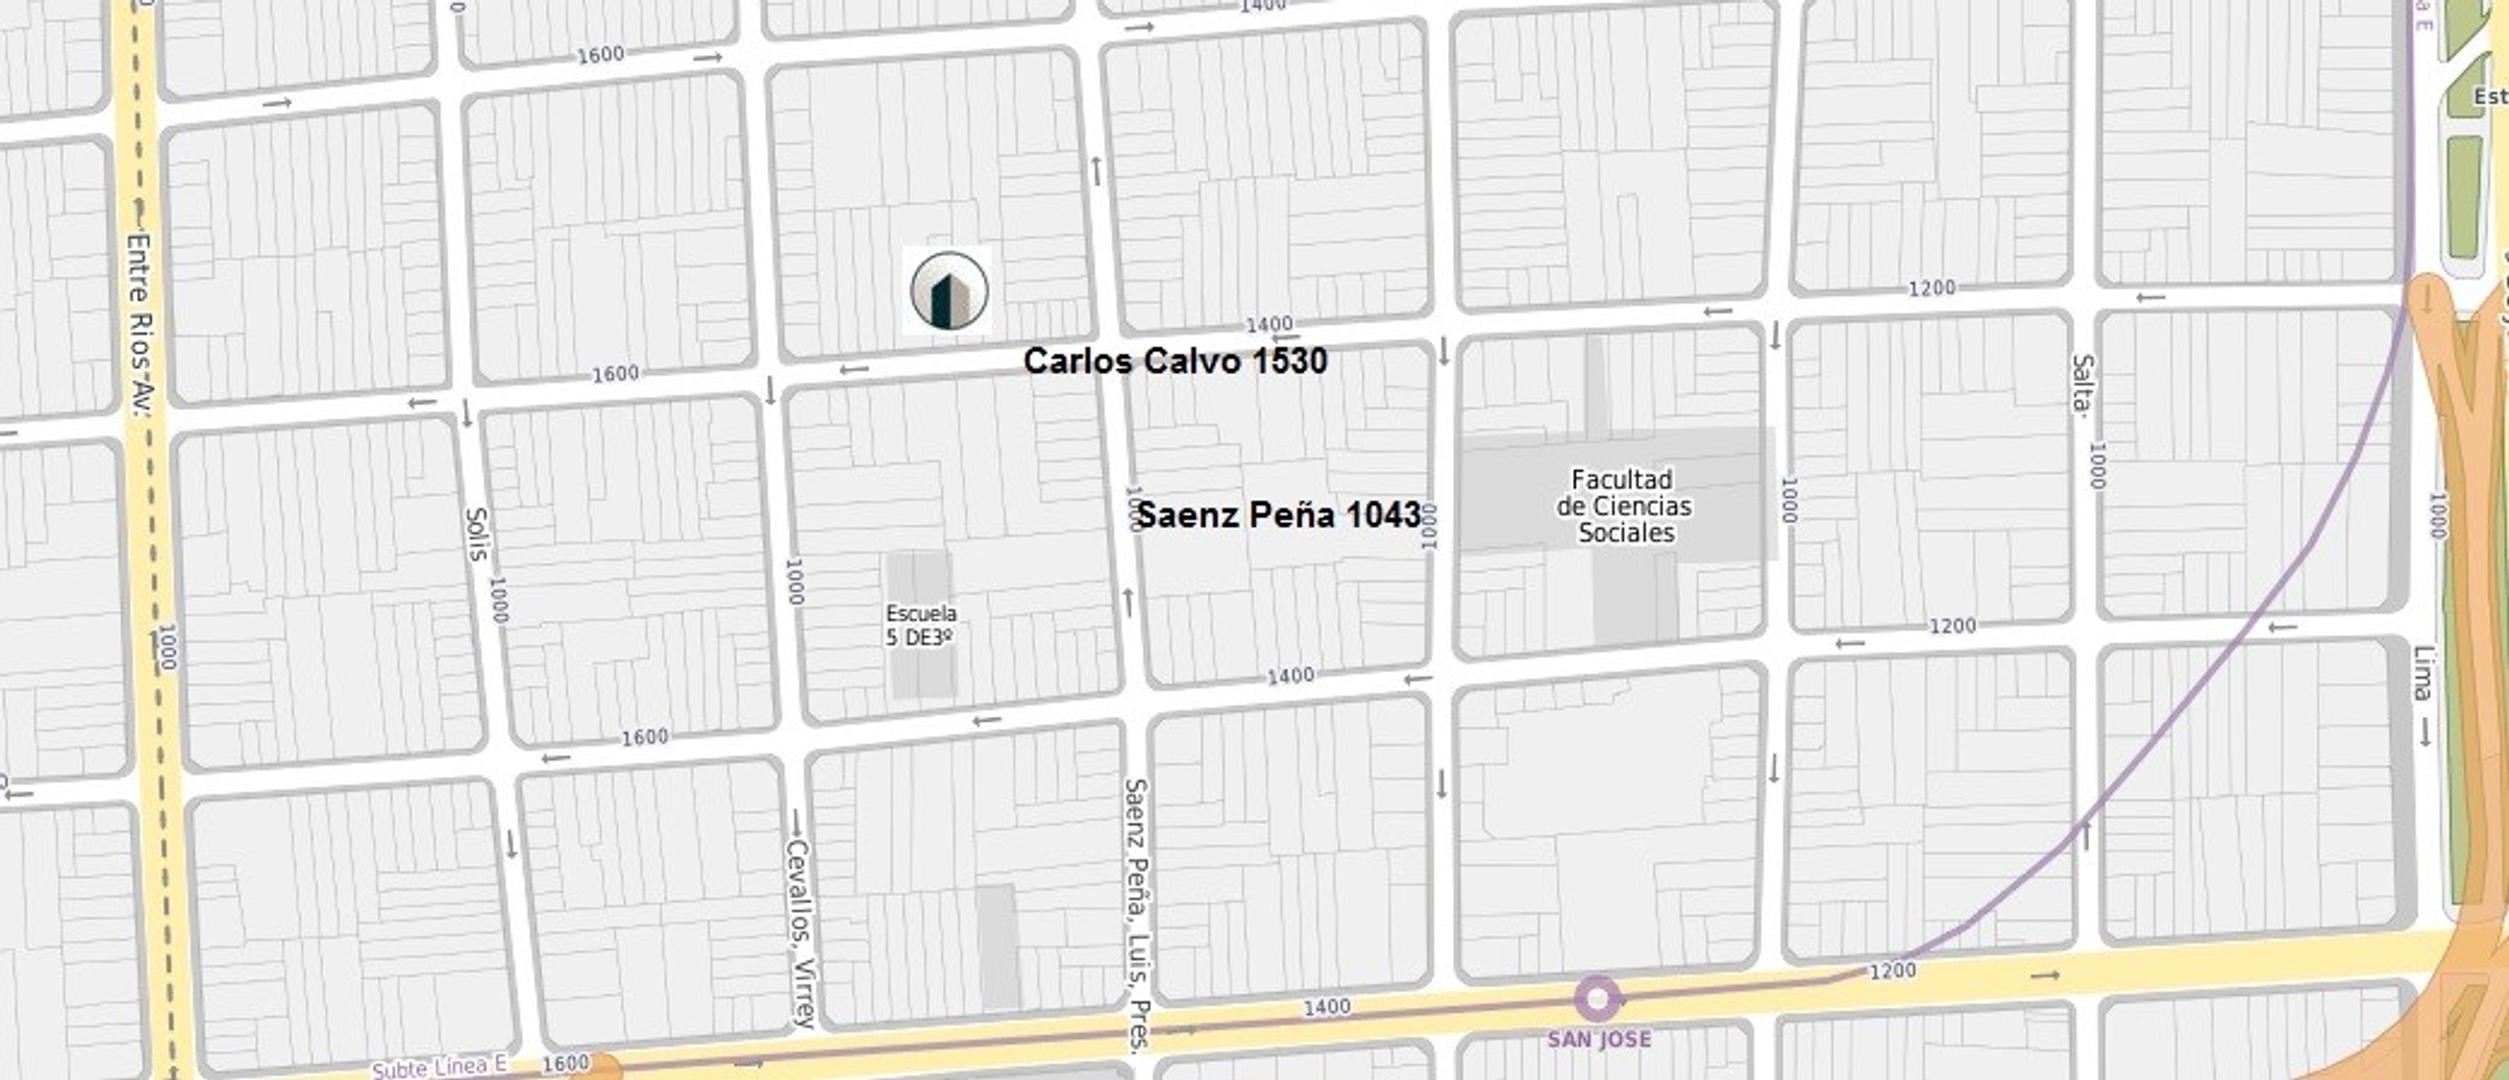 XINTEL(COI-COI-721) Departamento - Venta - Argentina, Capital Federal - Carlos Calvo 1530